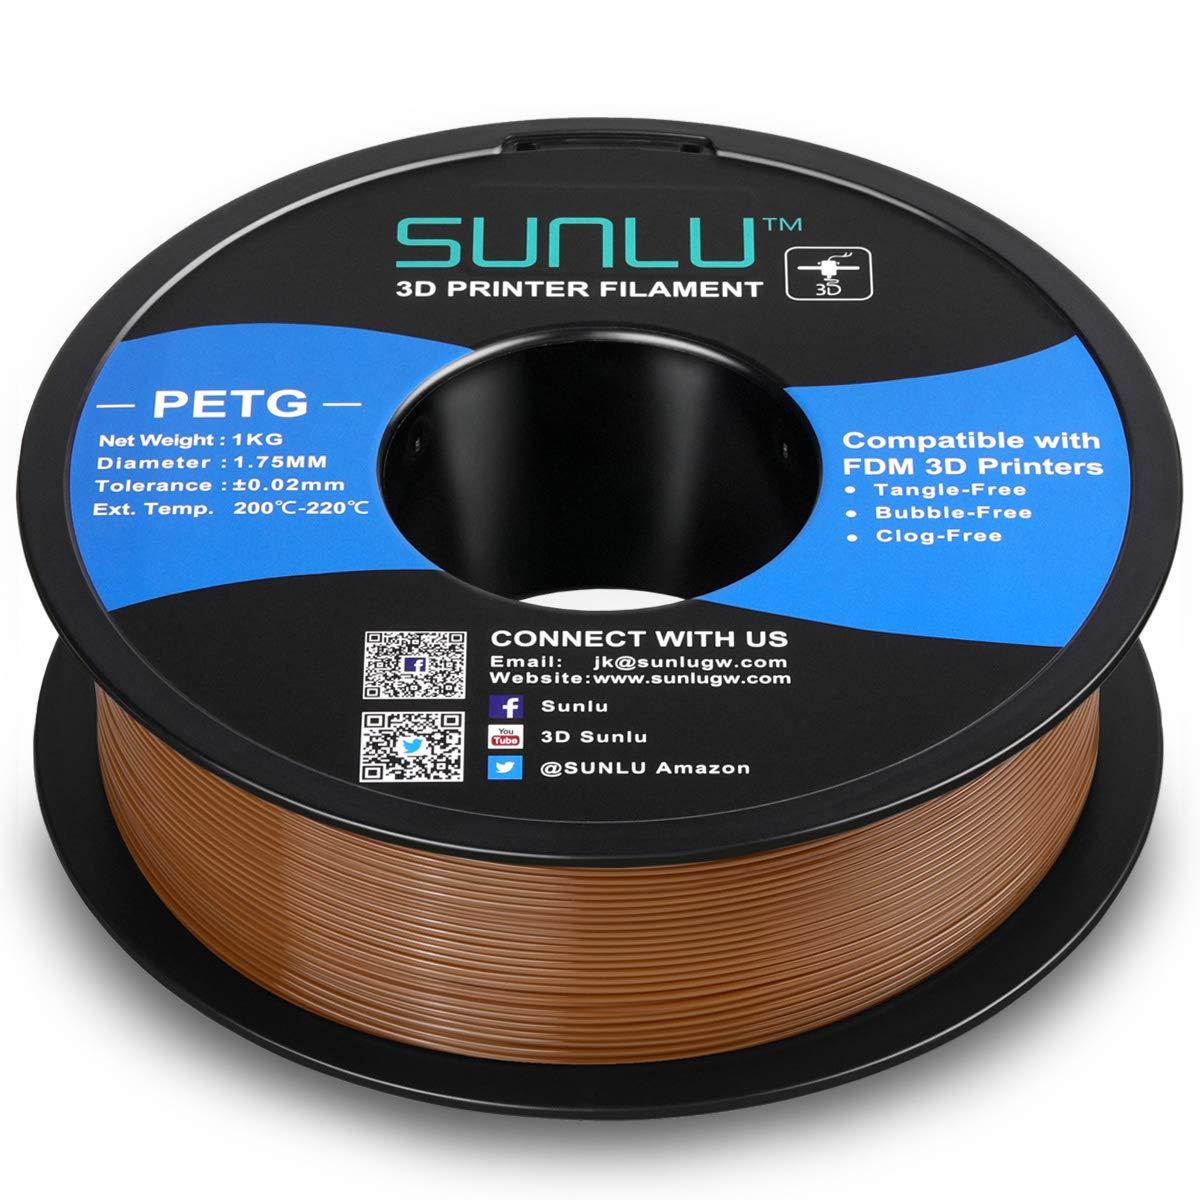 Dimensional Accuracy +//- 0.02 mm SUNLU PETG Filament 1.75mm with sunlu upgrade 1kg Spool Fit Most FDM Printer 2.2lbs Blue